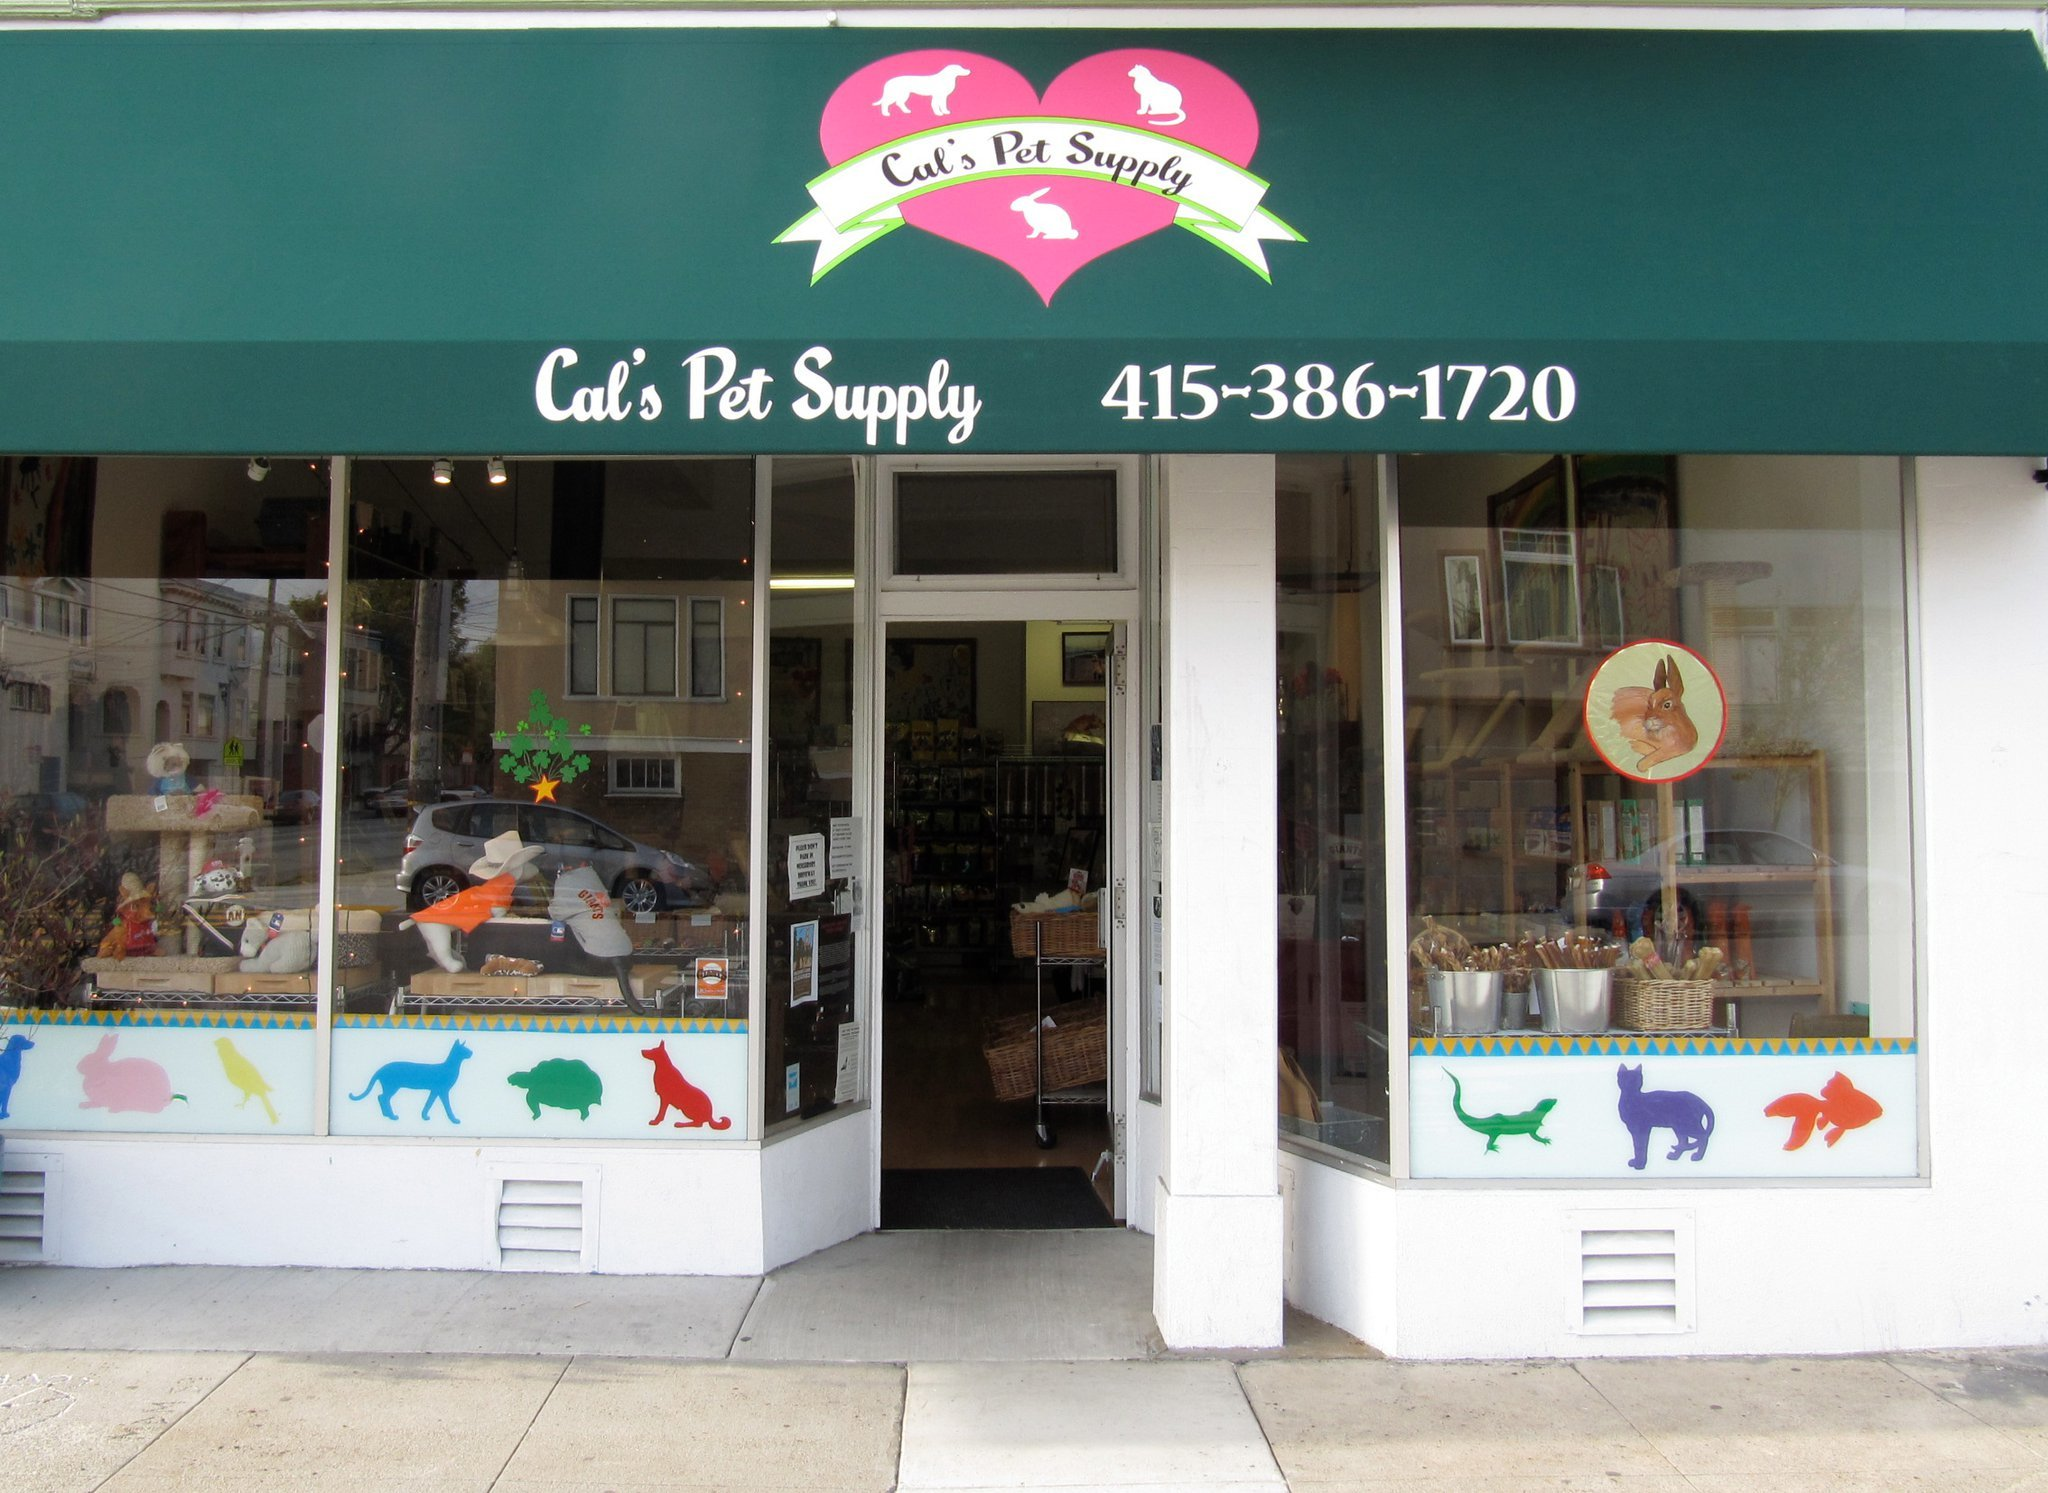 Cal's Pet Supply